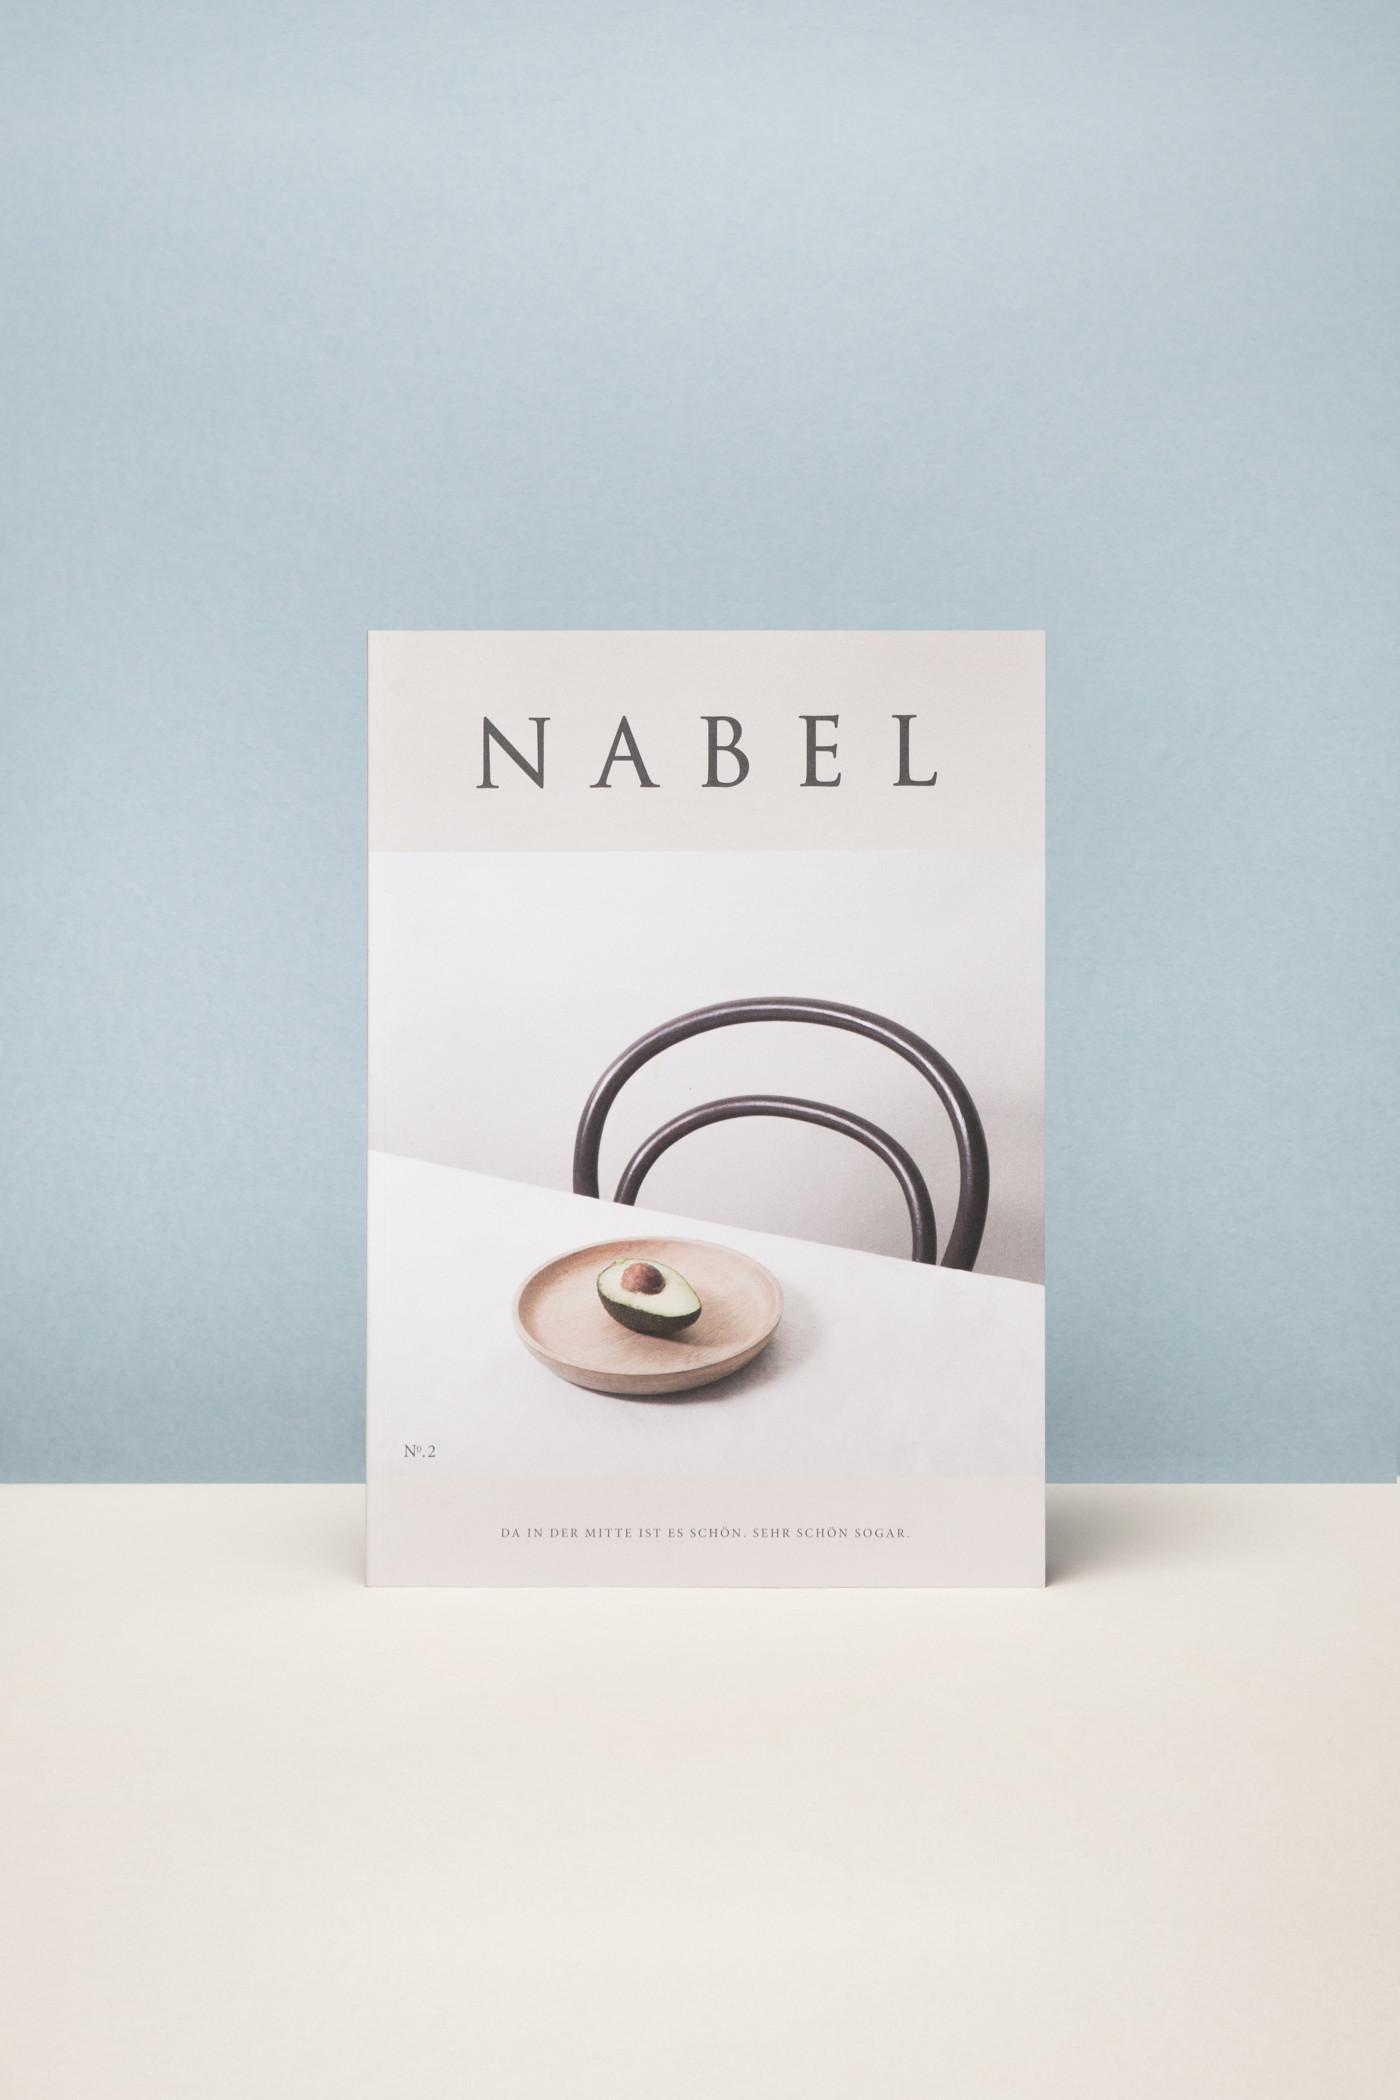 WWW.NABEL.AT